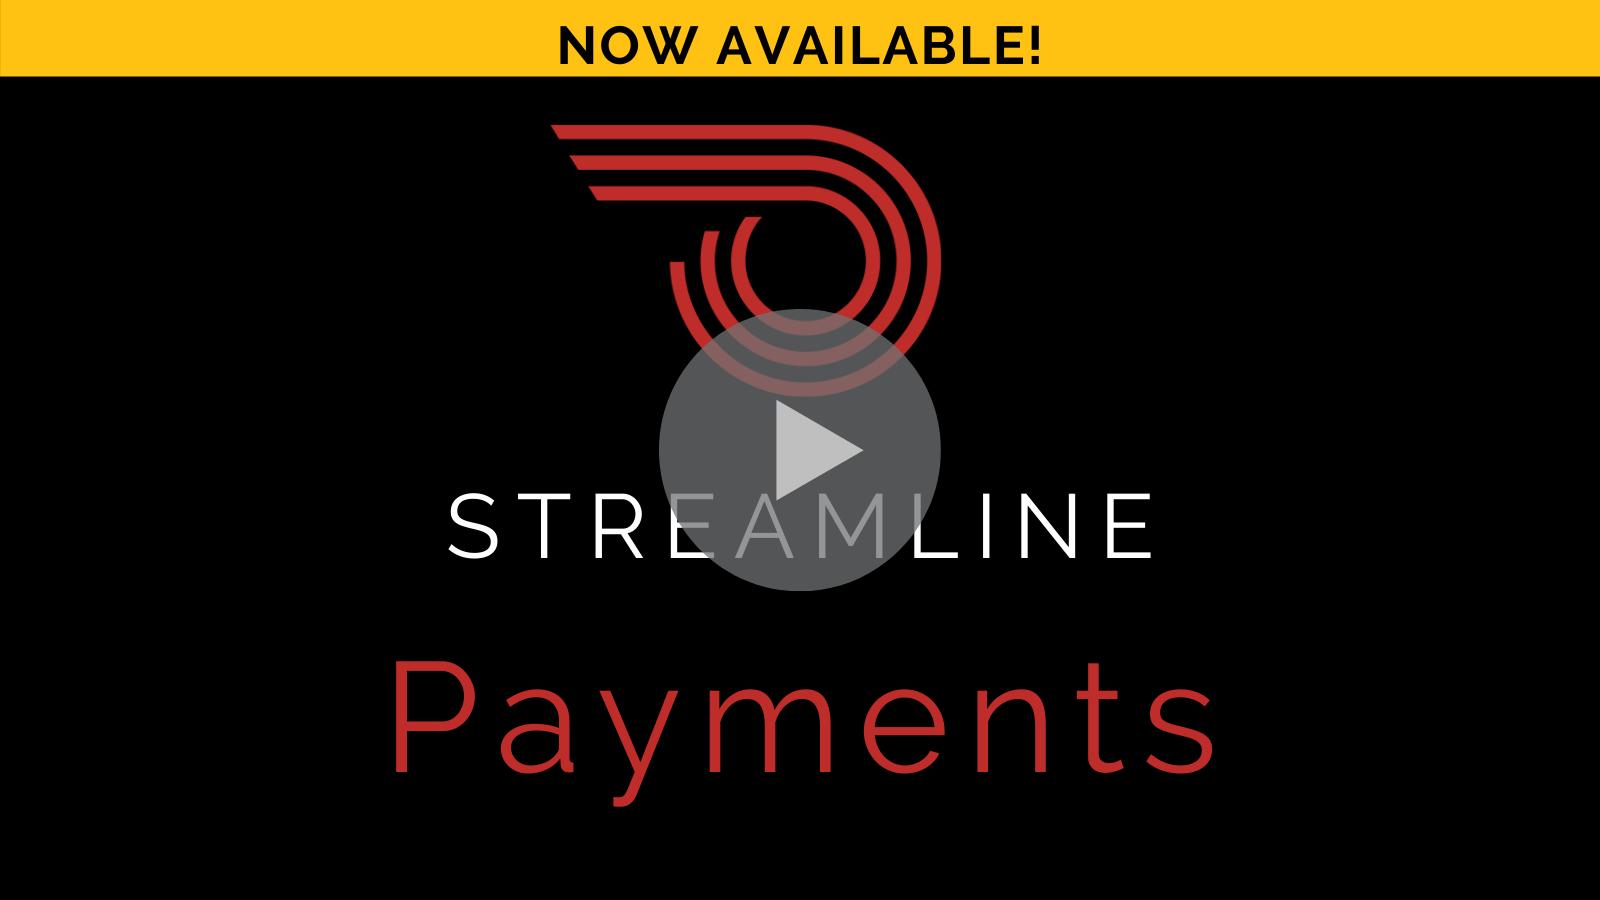 Streamline Payments Promo Demo 2 (3)